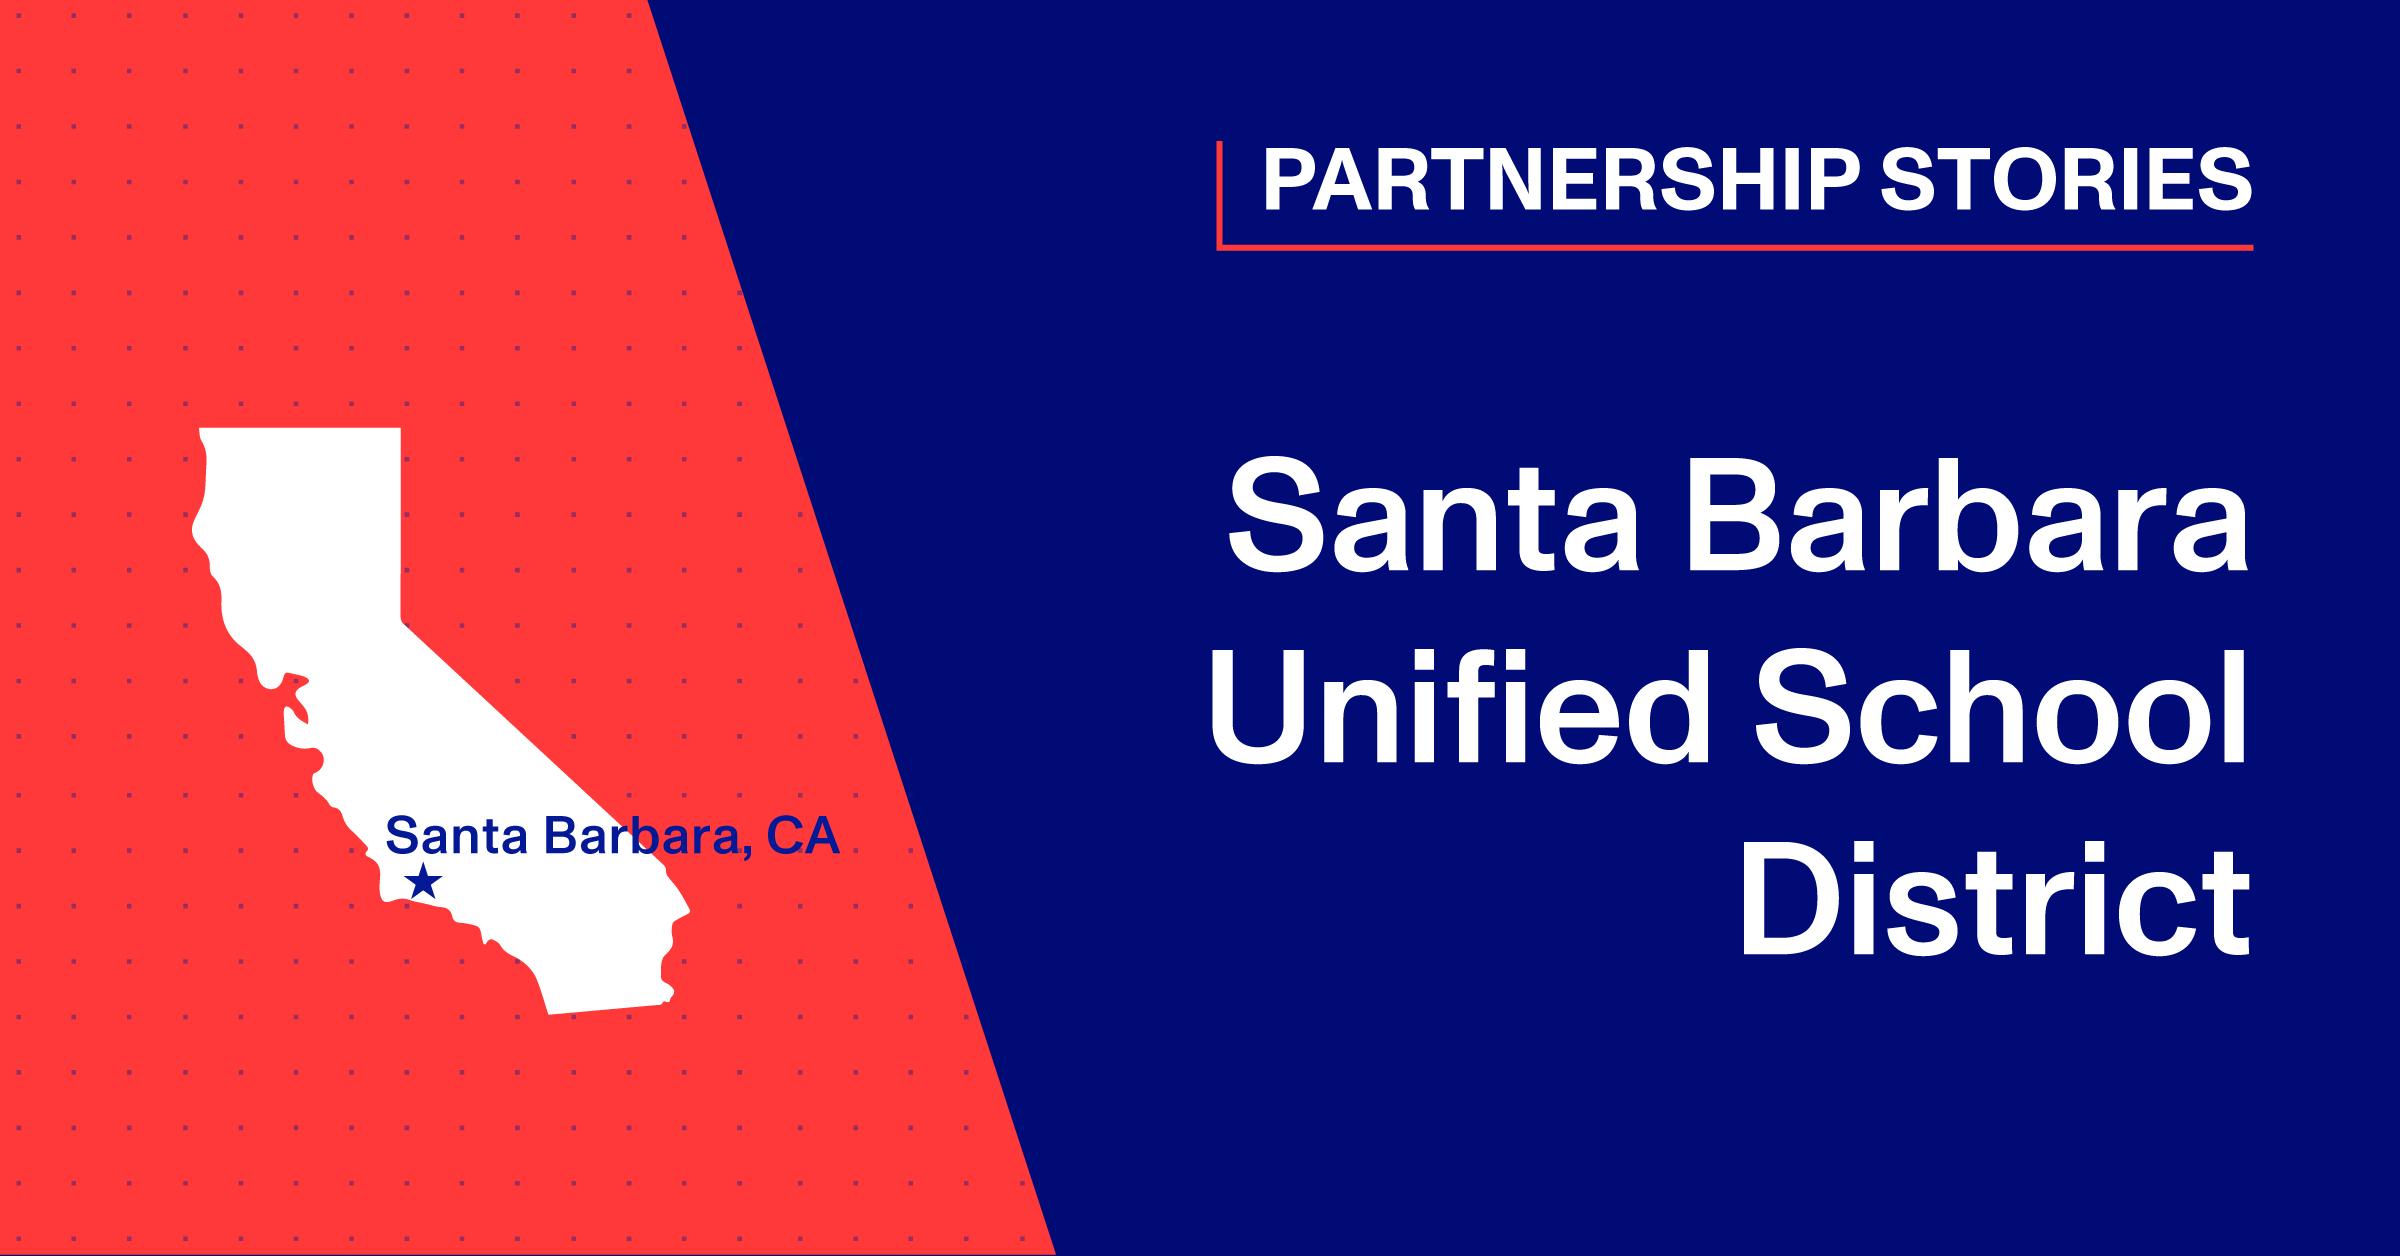 Santa Barbara Unified School District